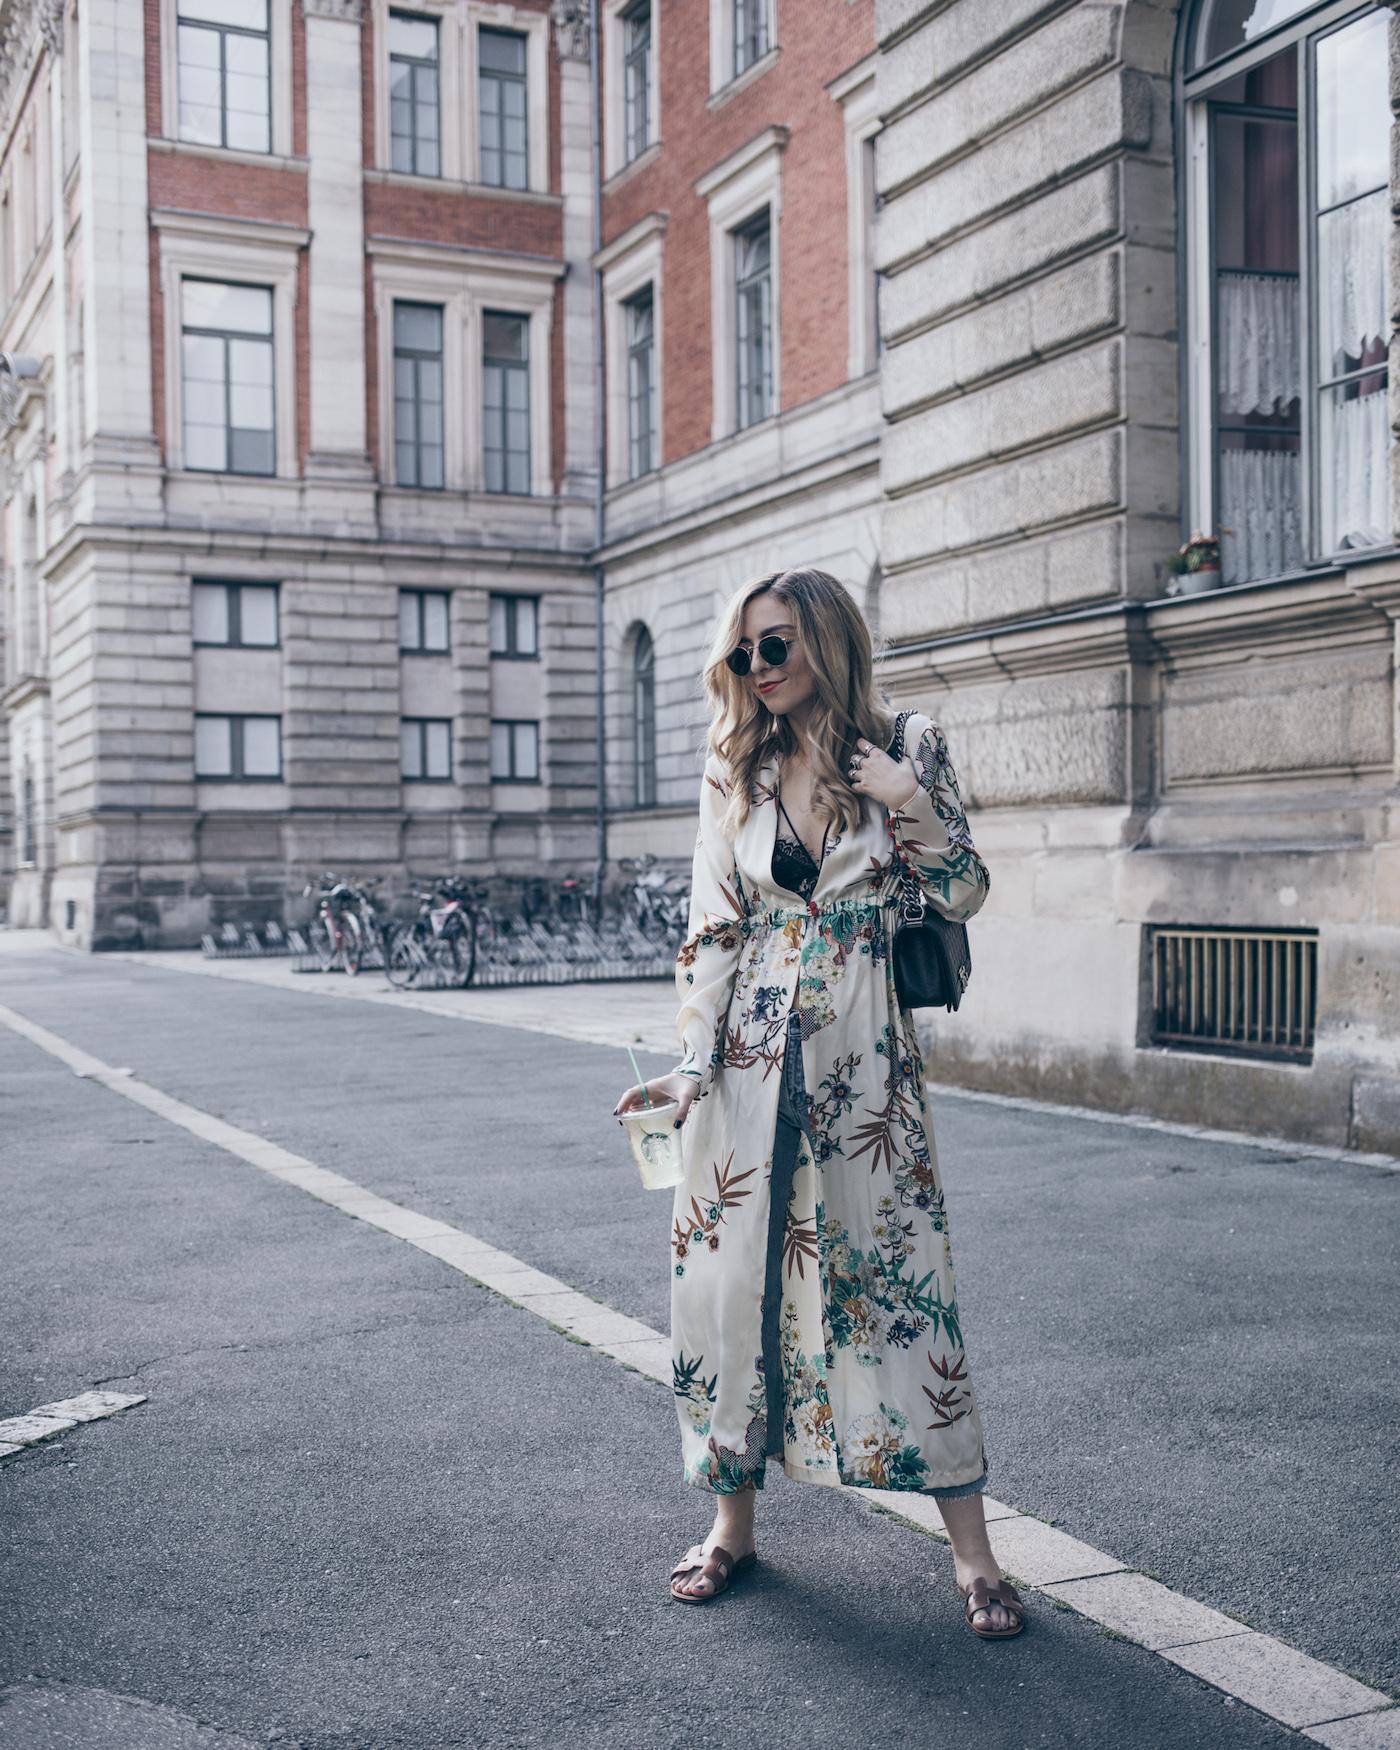 Fashion-Blog-Blogger-Q A-Kimono-Outfit-Street-Style-Zara-Summer-2017- WantGetRepeat-Blog-Erlangen-01 cc6fb5469